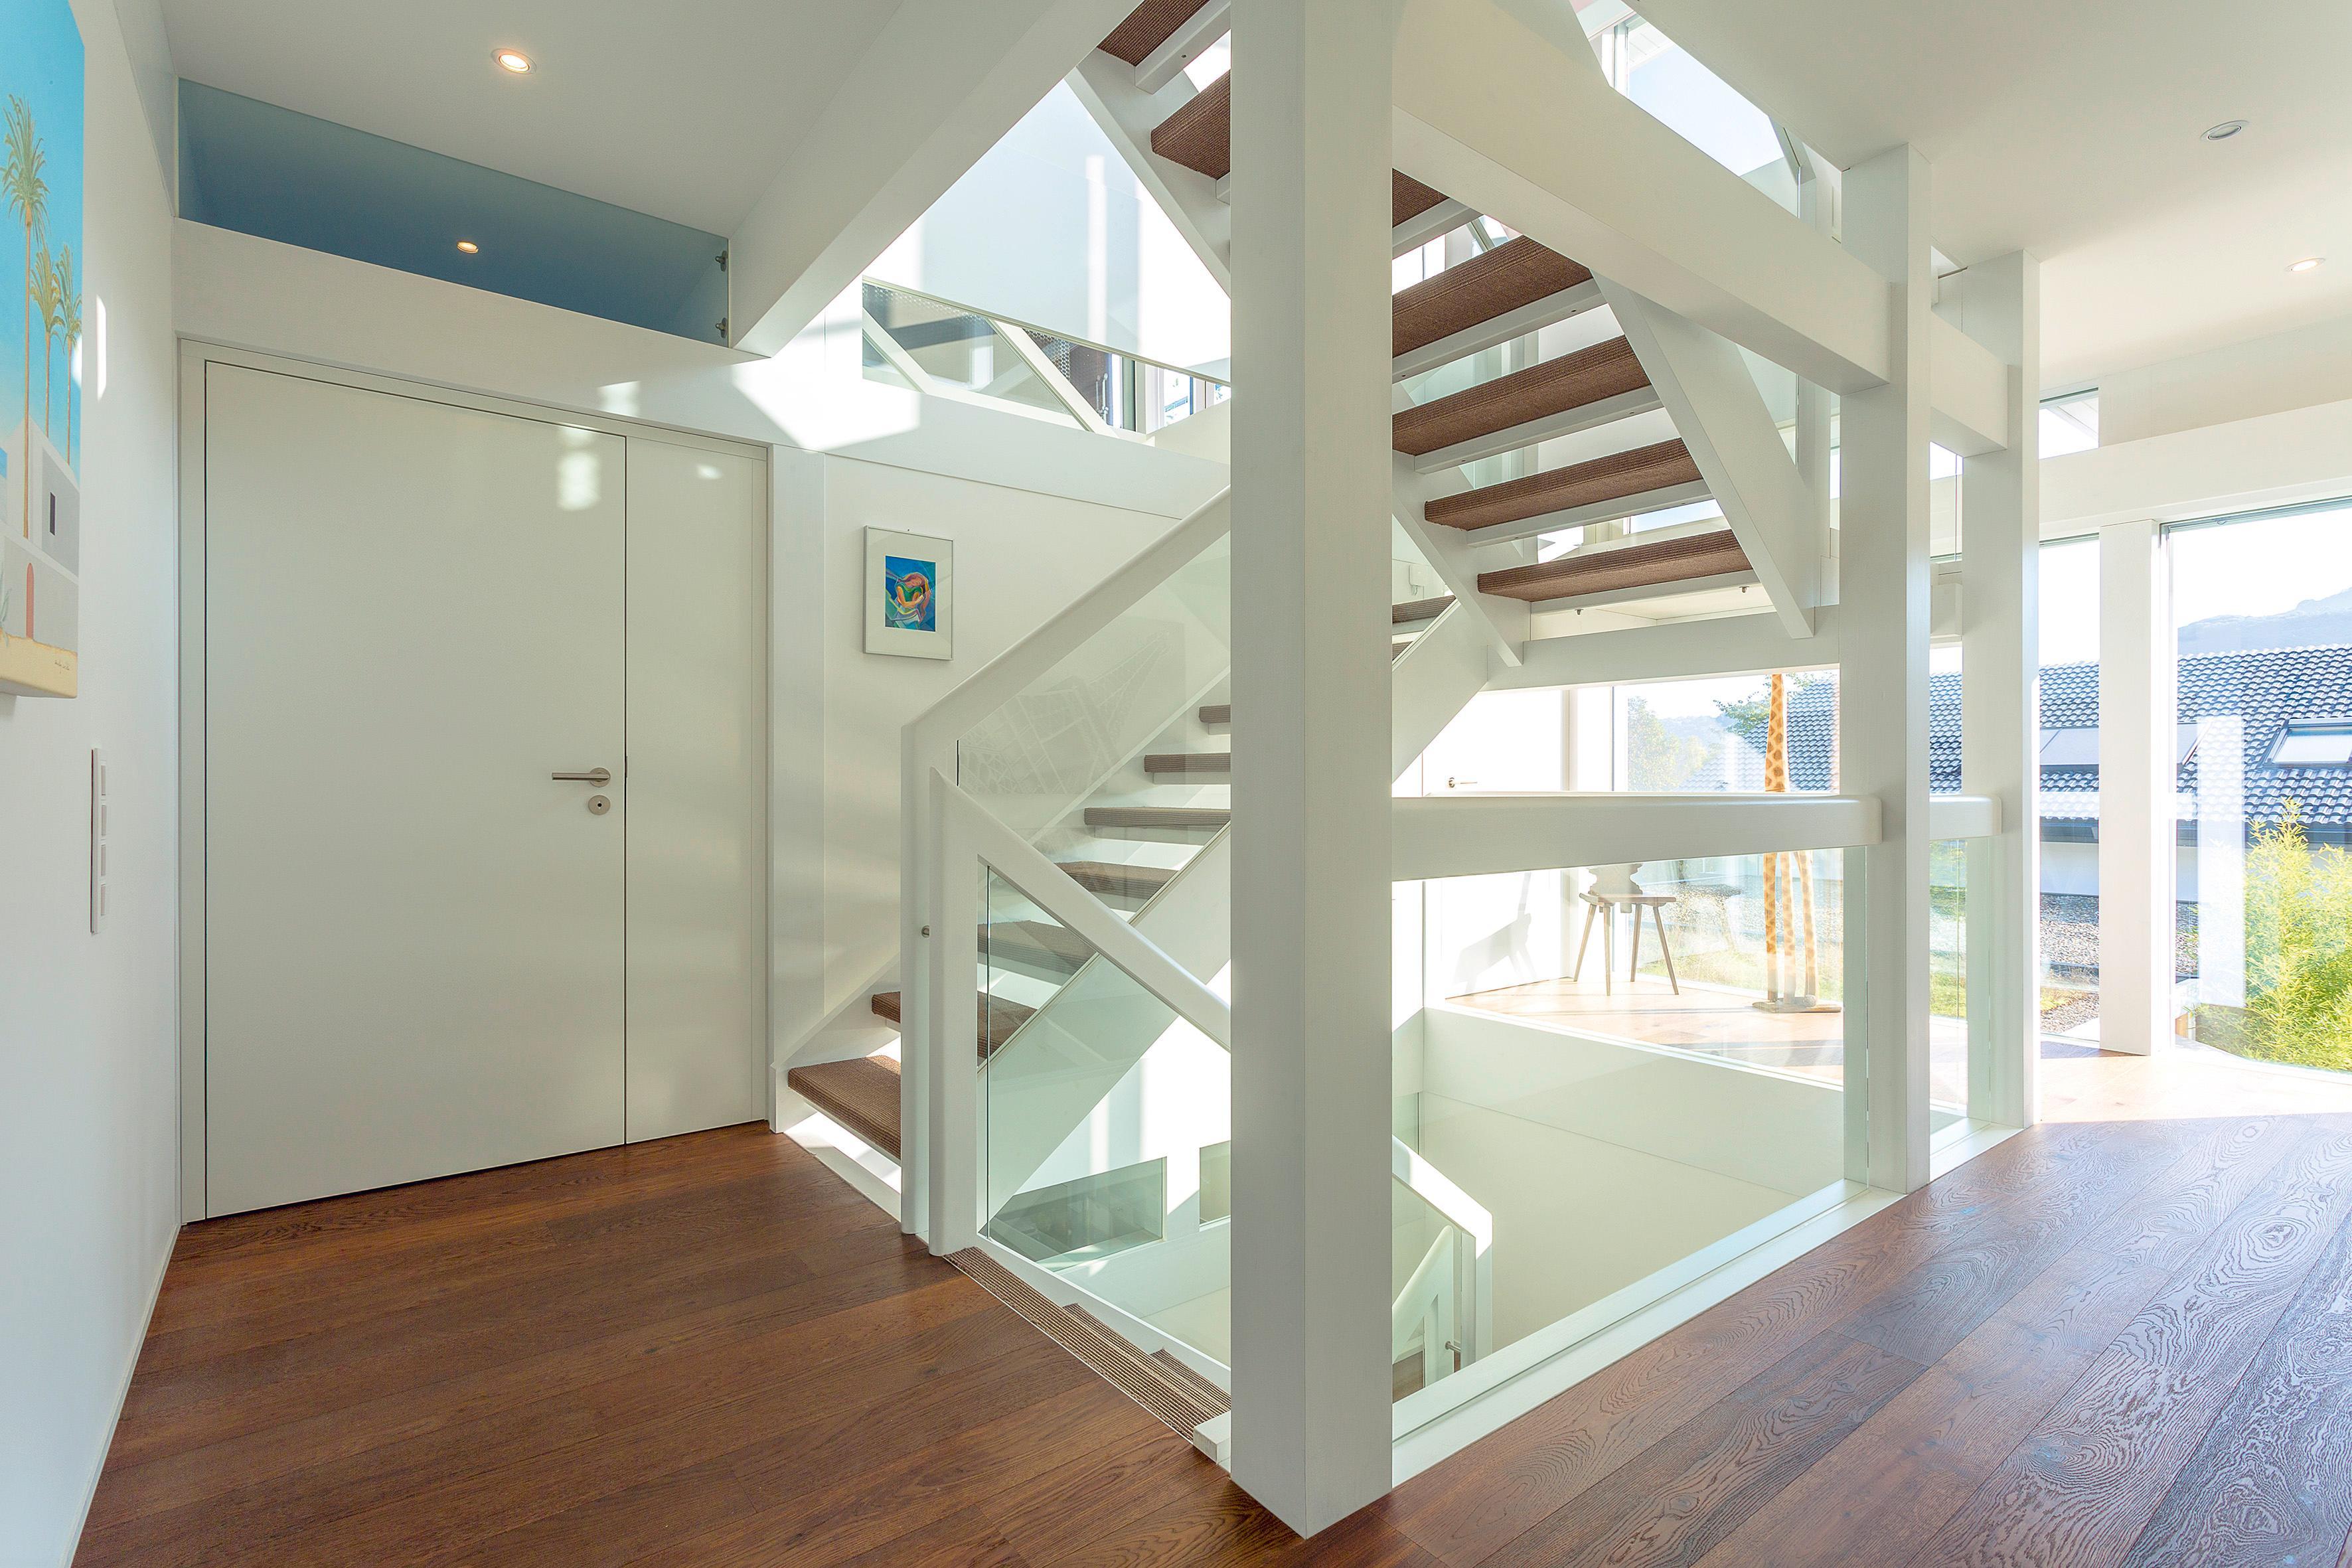 Offene Treppen offene treppe bilder ideen couchstyle